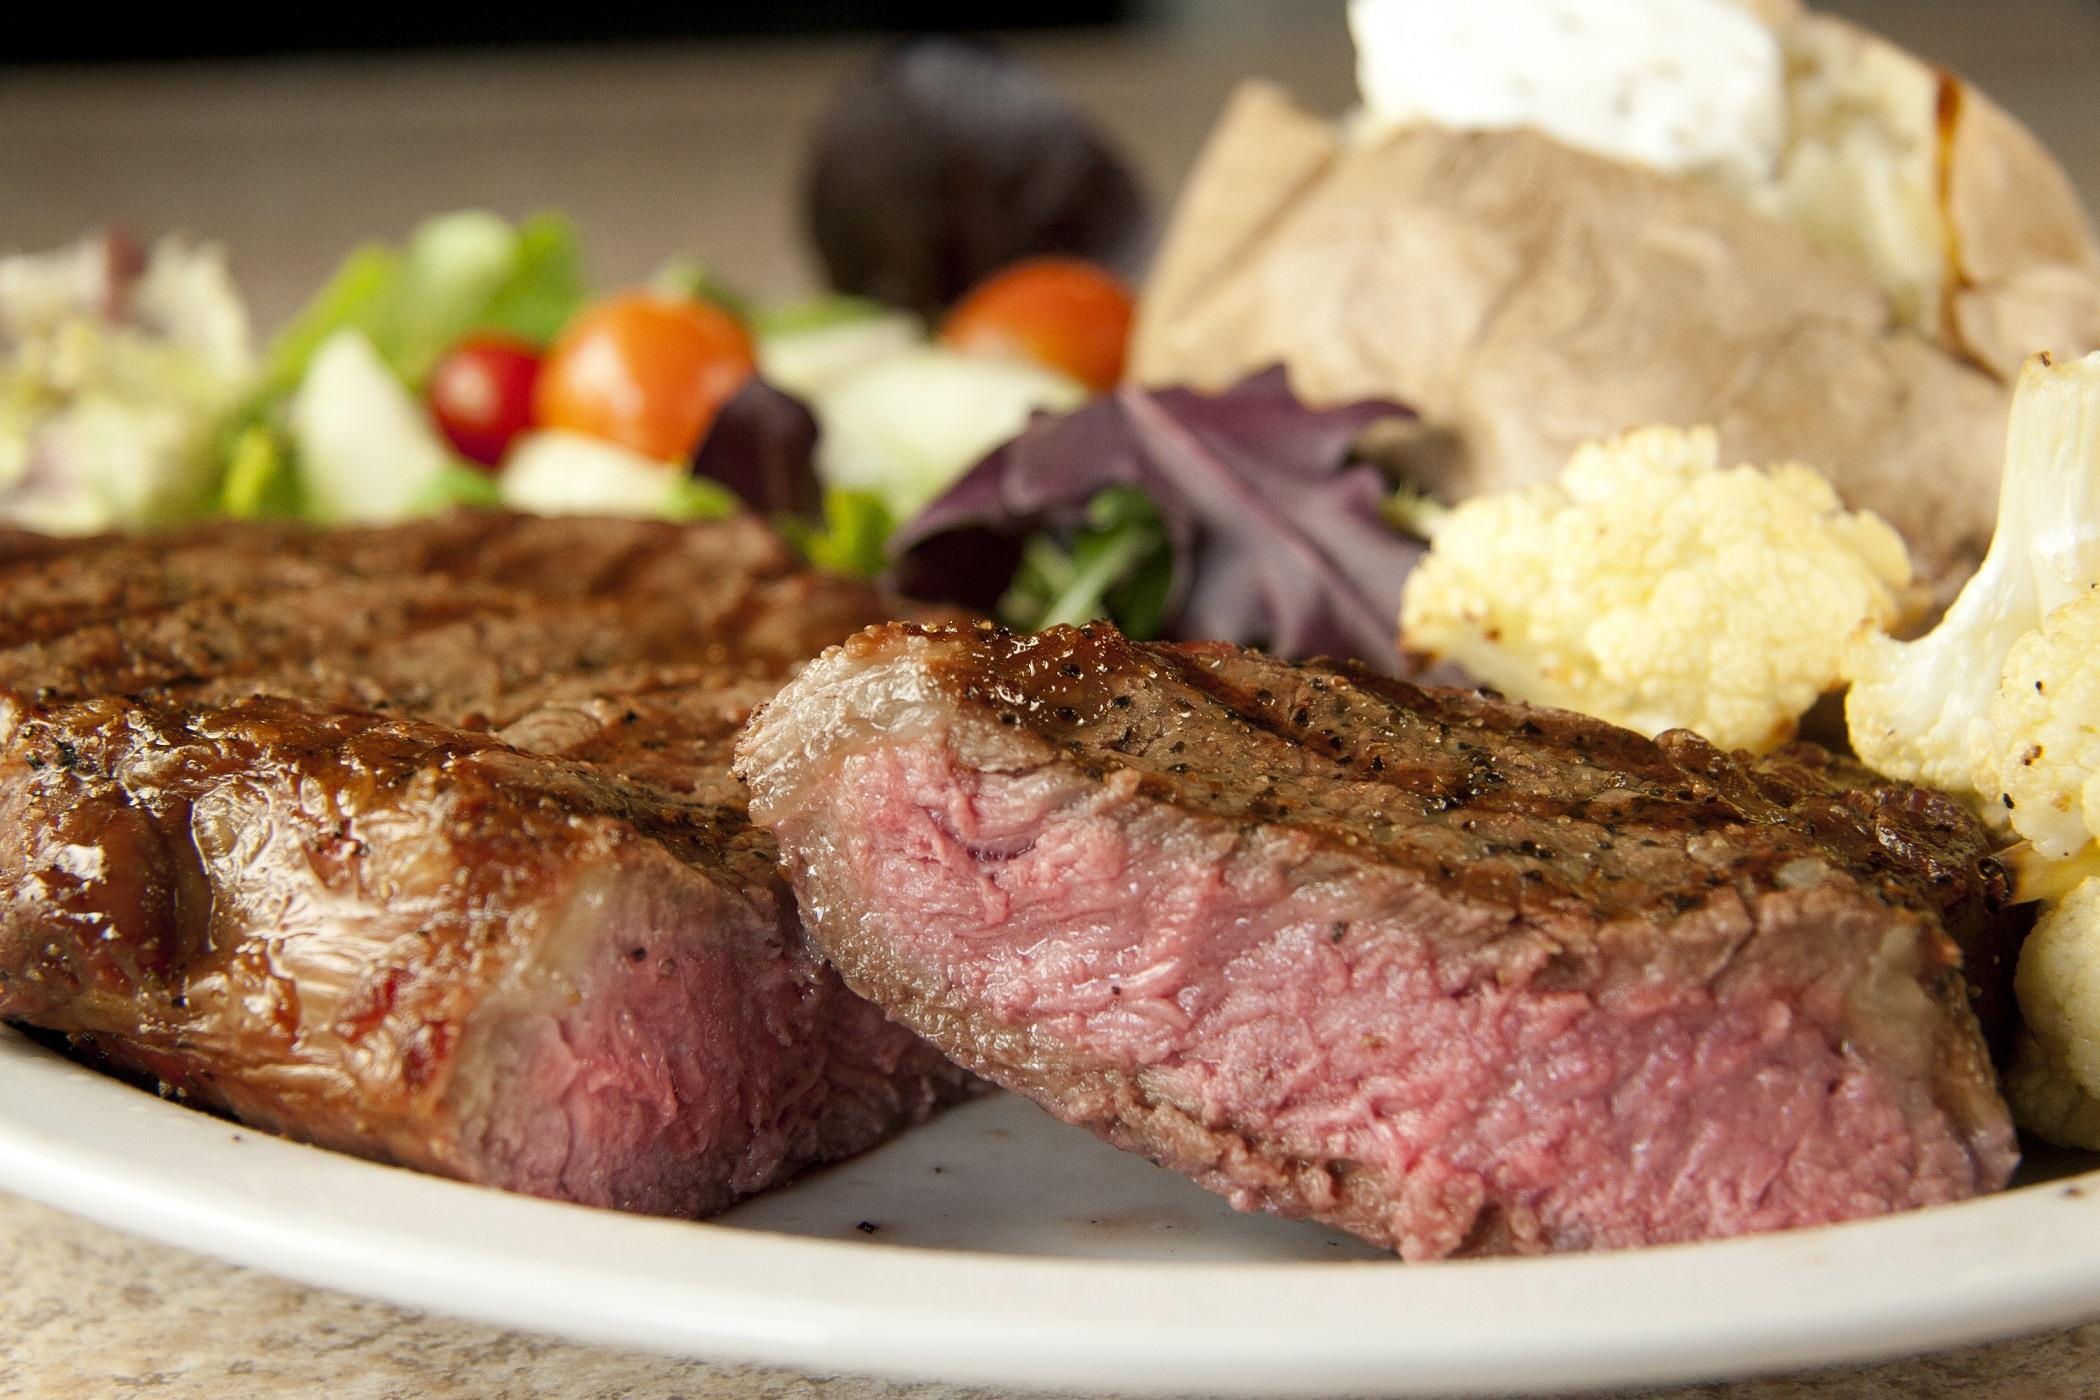 Rib eye steak with baked potato and salad